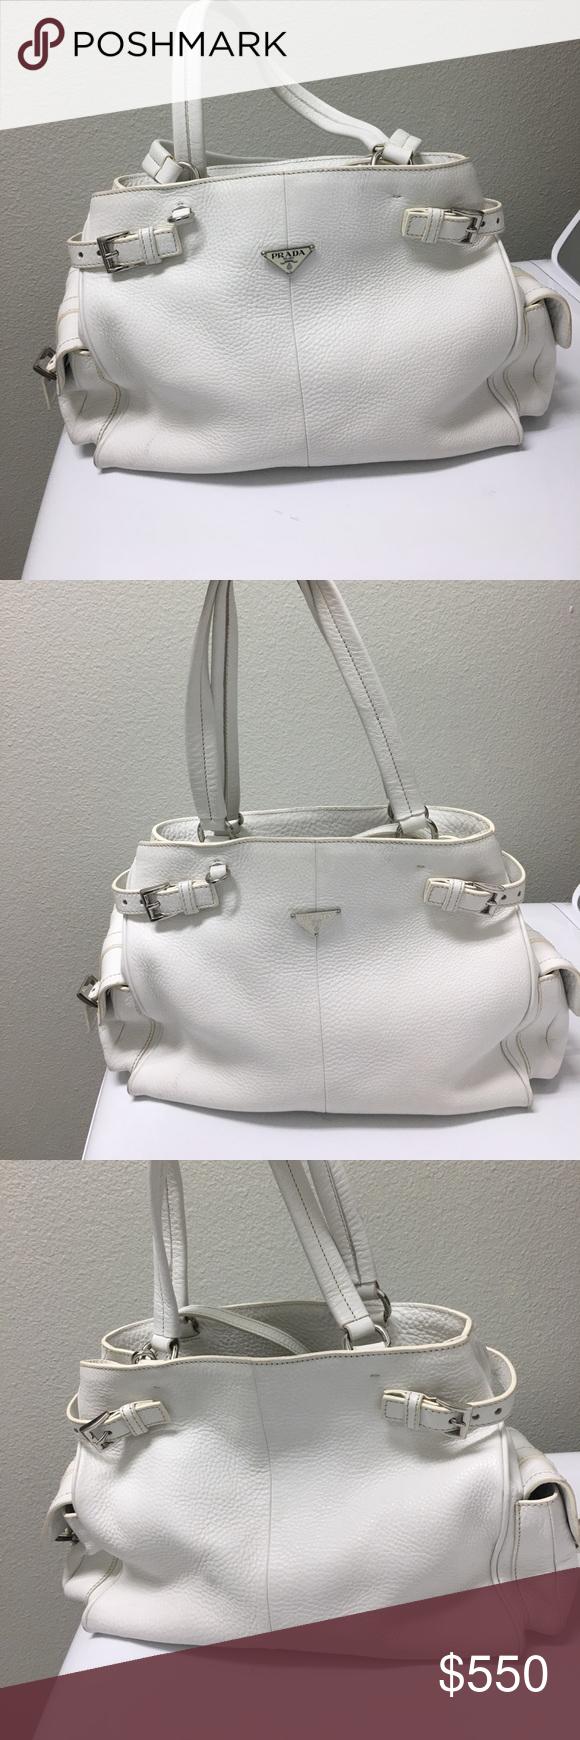 bce46c2904f2 ⚡ ⚡️Flash Sale 8pm-9pm Authentic Prada Bag White Prada Bag approximately 12W